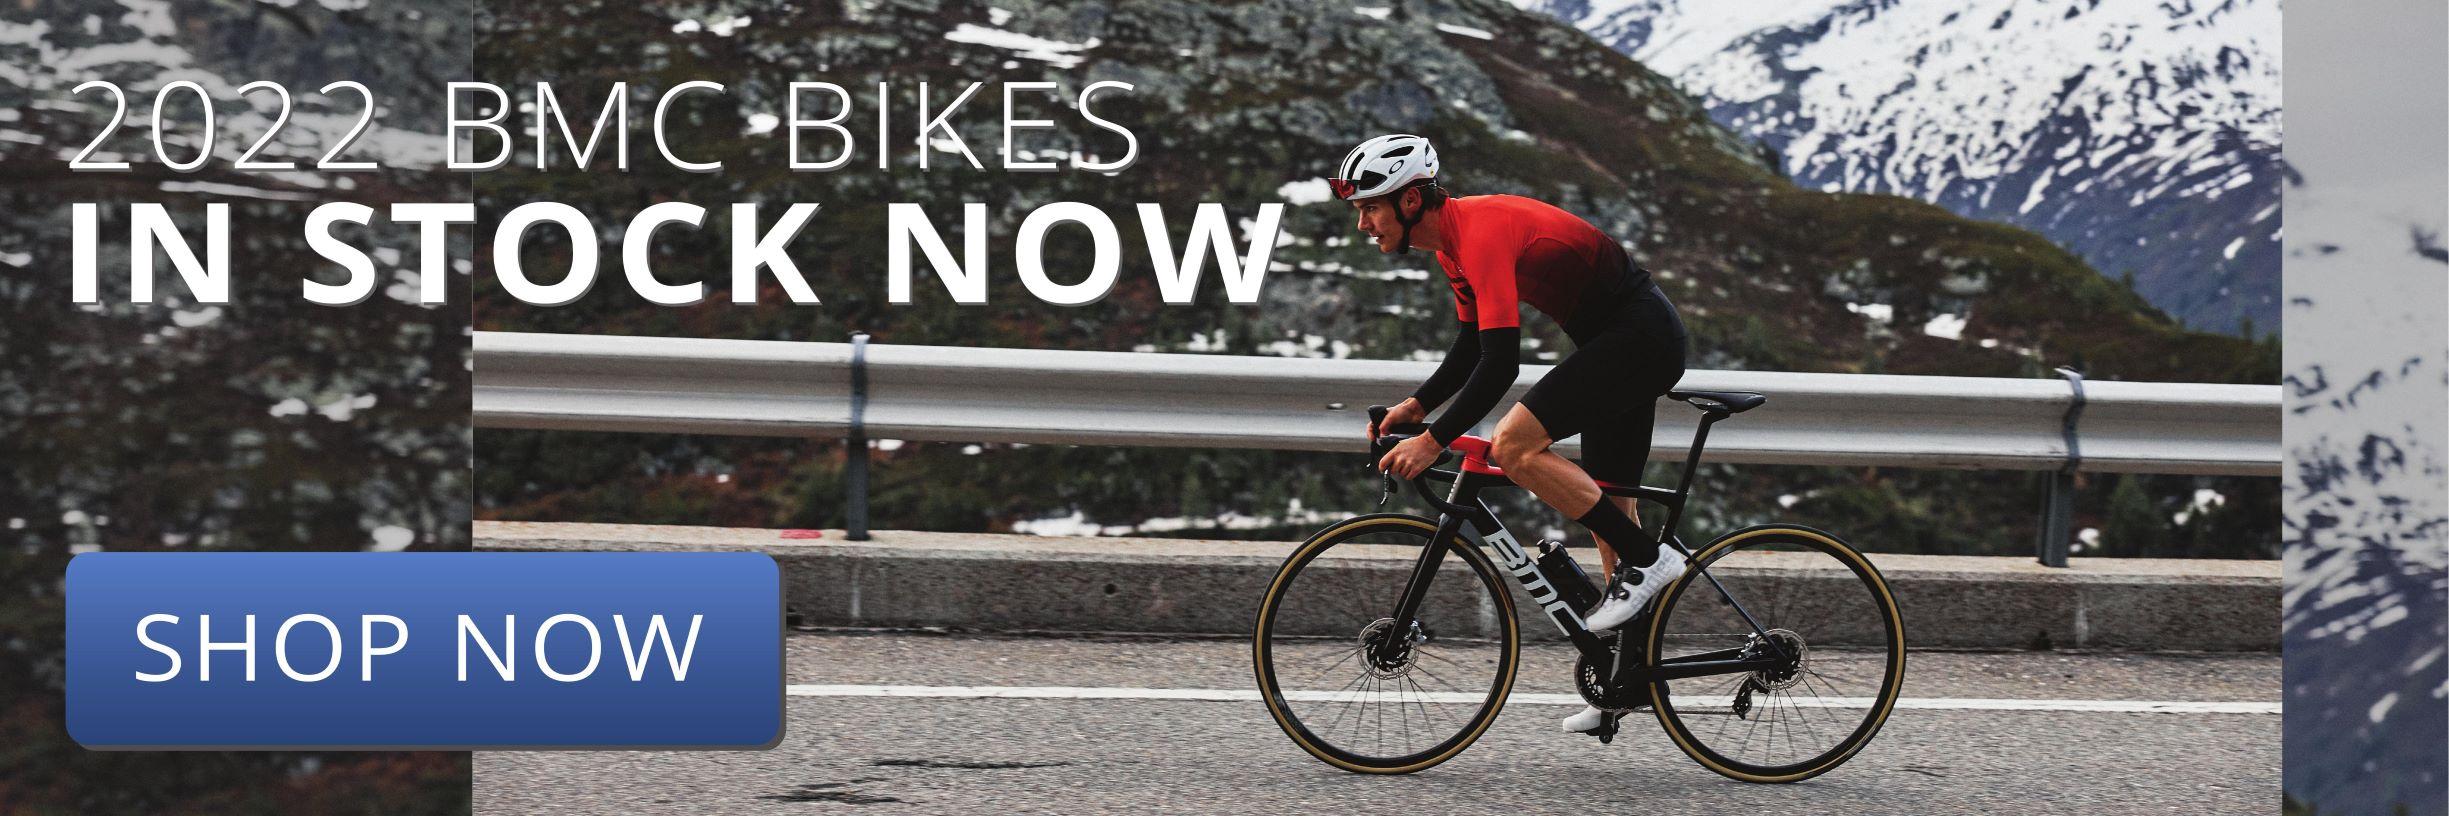 2022 BMC Bikes In Stock Now - Shop Now